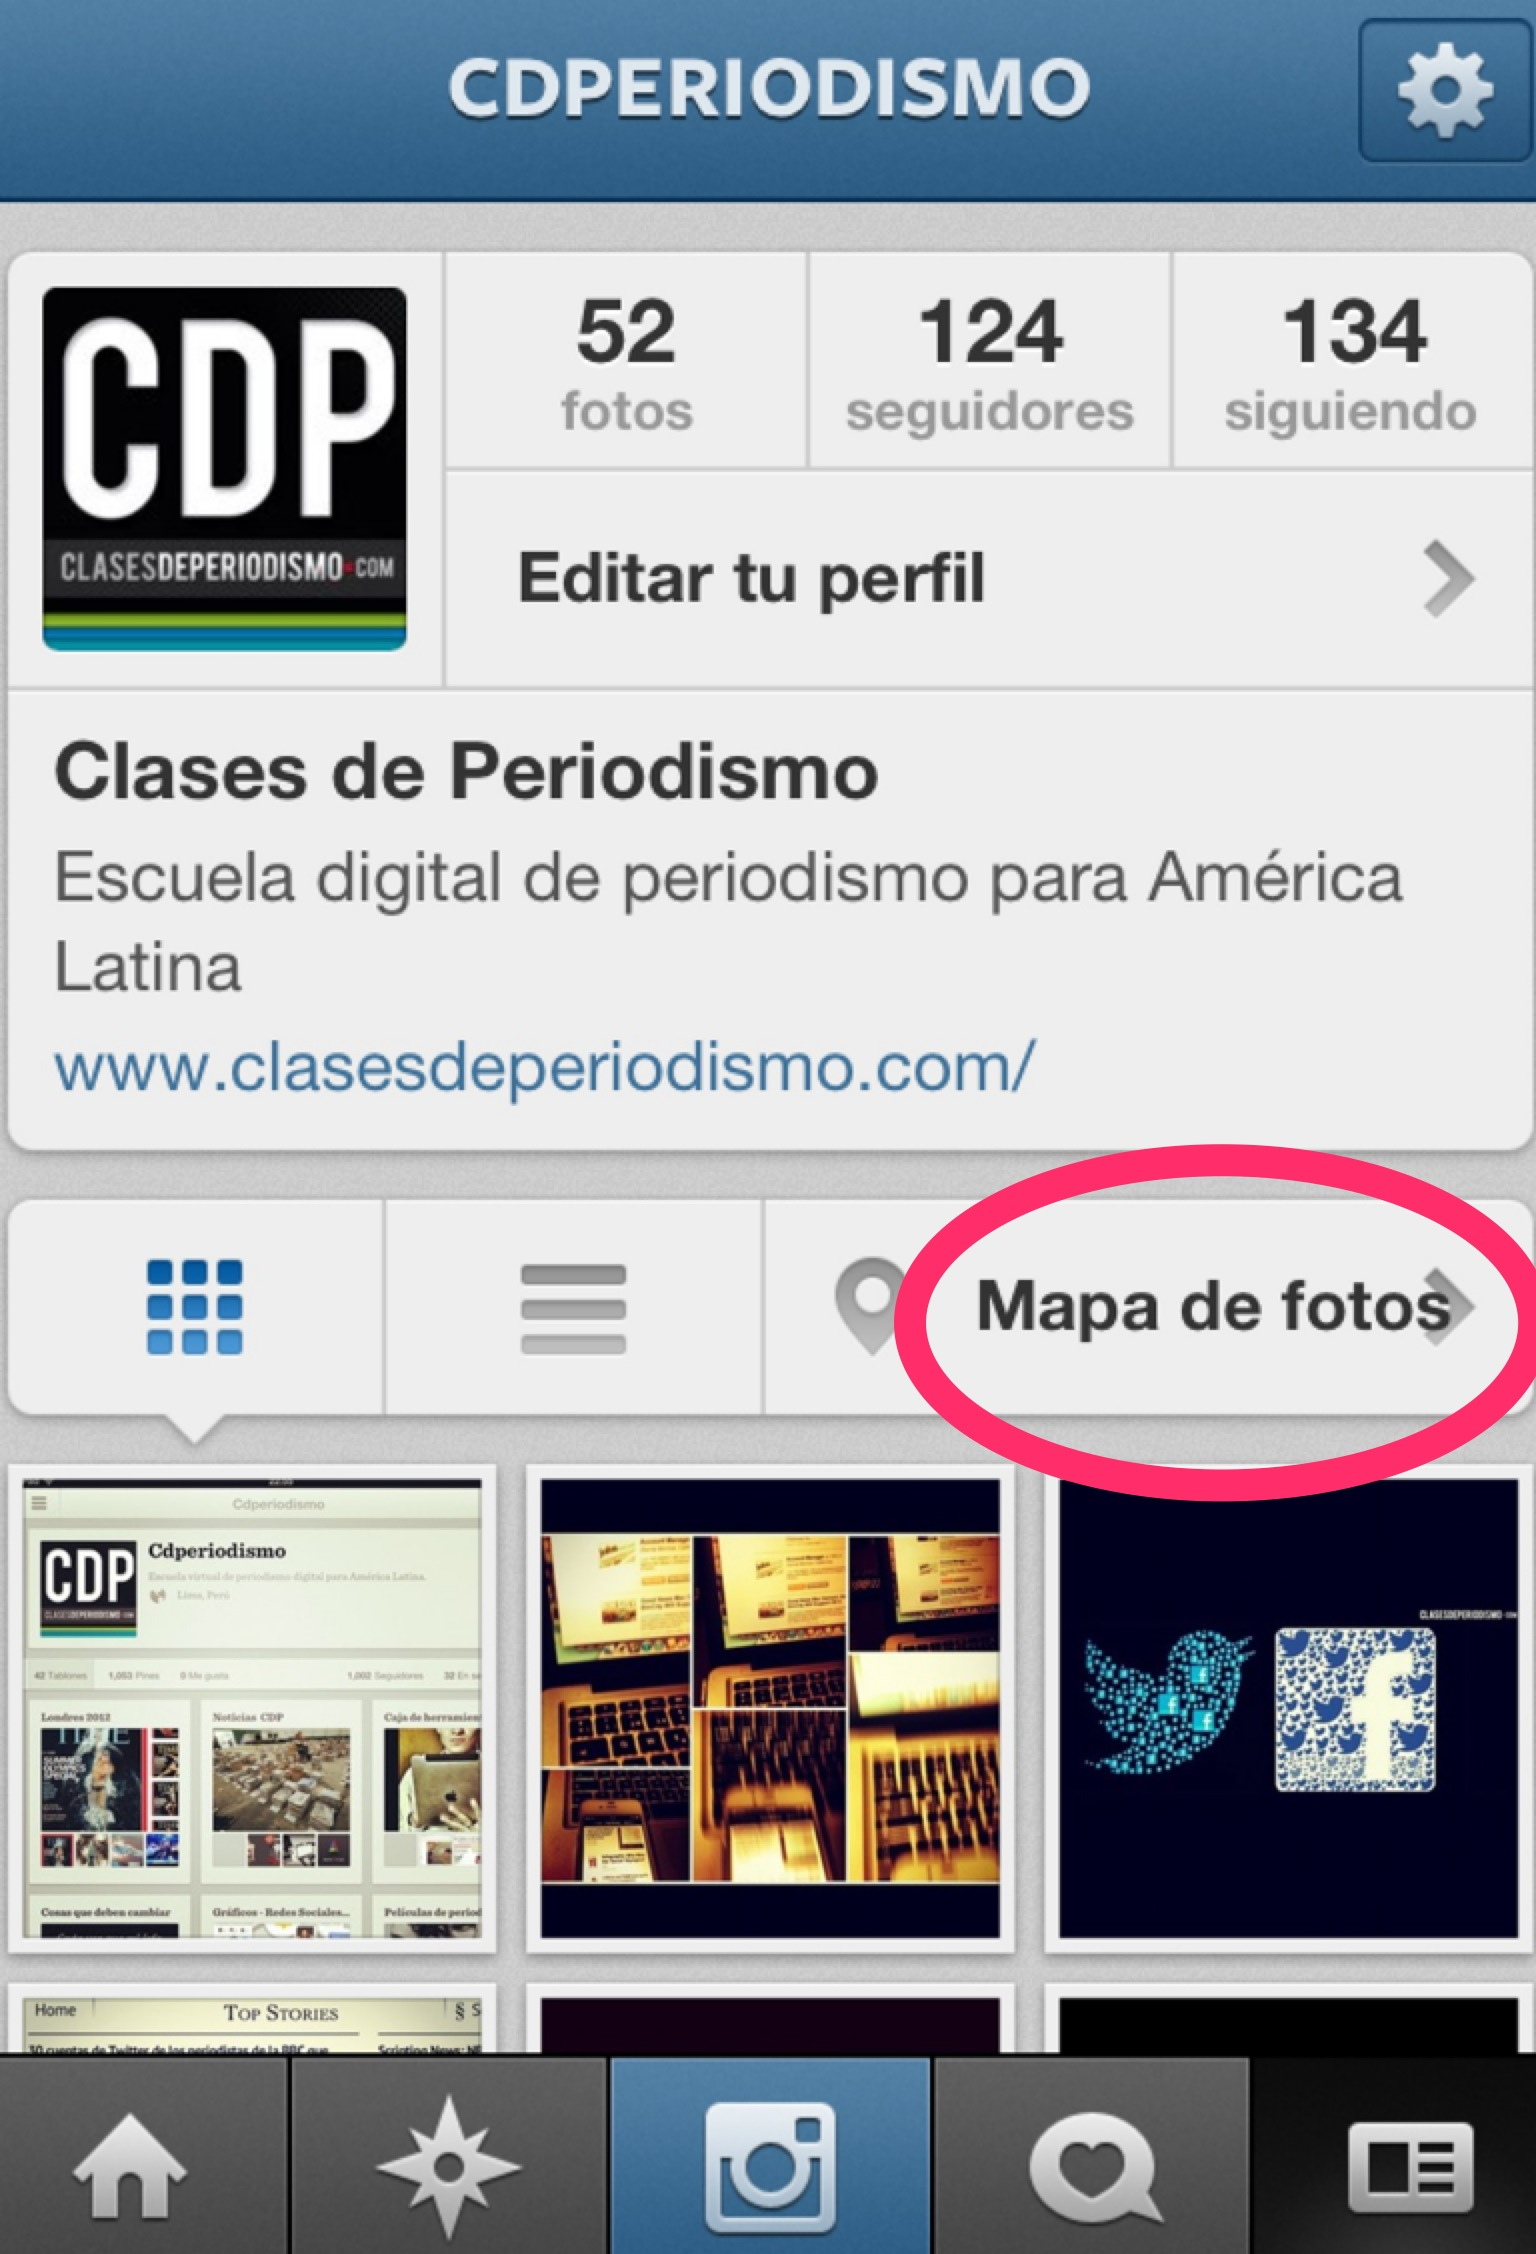 Instagram cdperiodismo